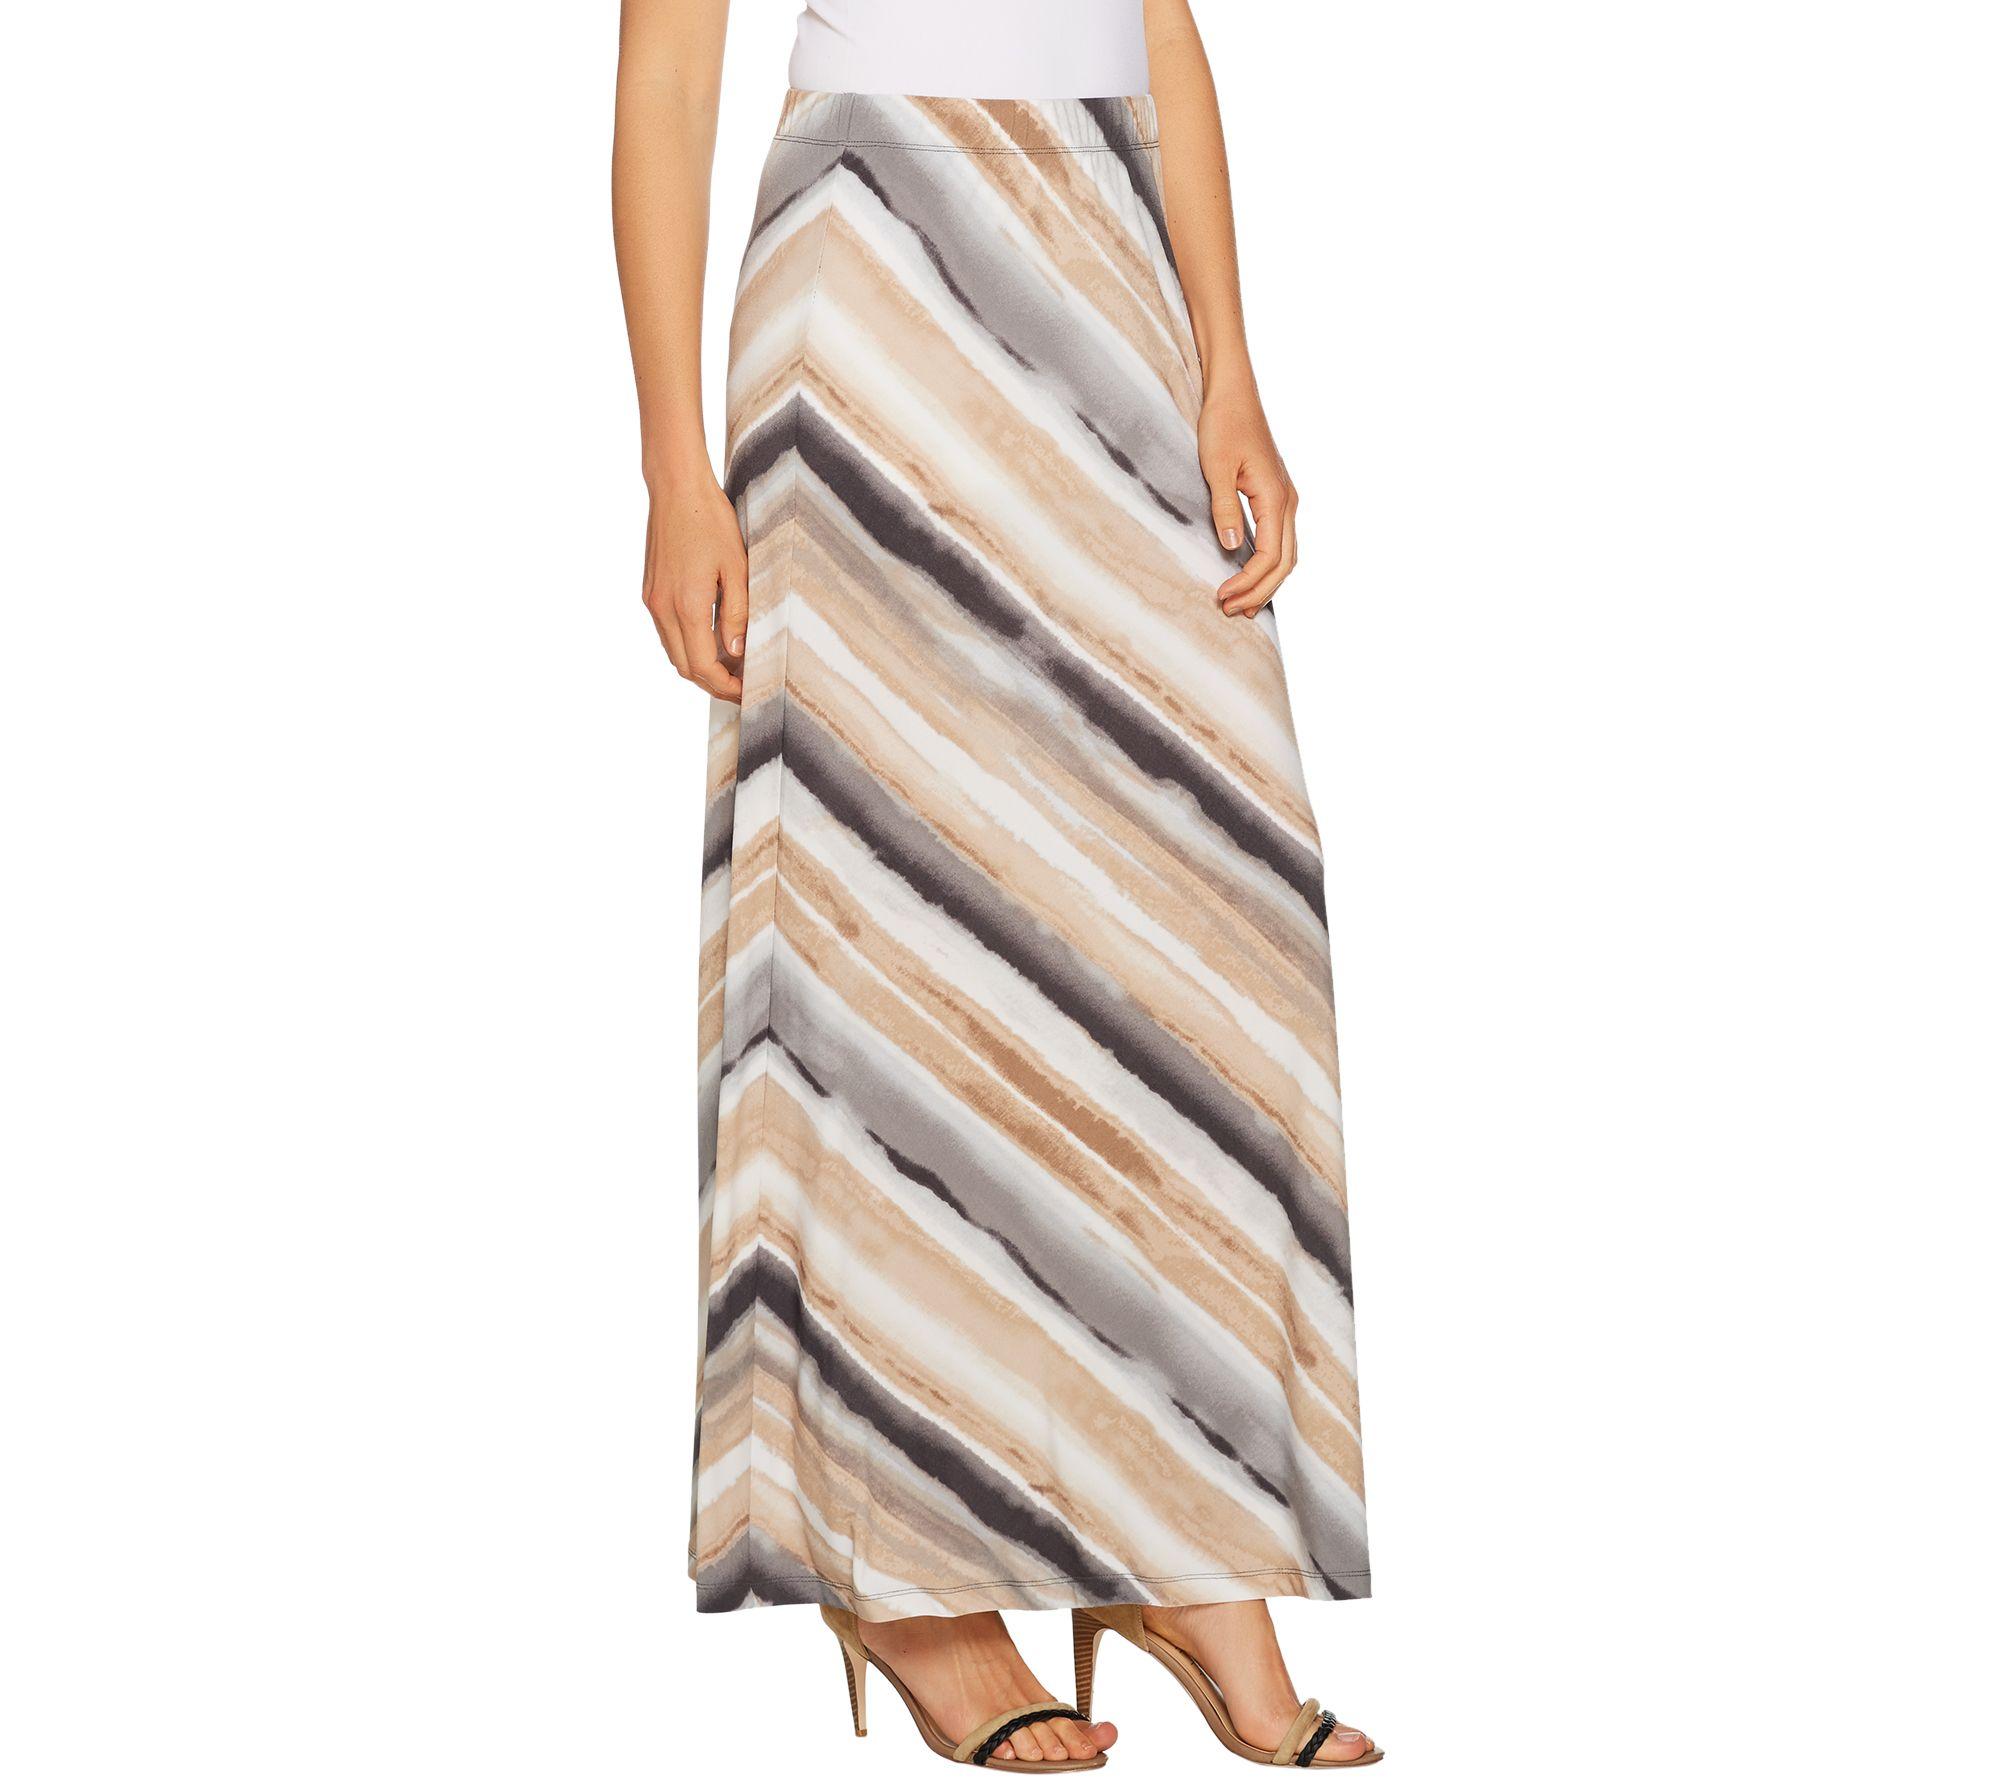 36d28aa670 Susan Graver Printed Liquid Knit Maxi Skirt - Regular - Page 1 — QVC.com